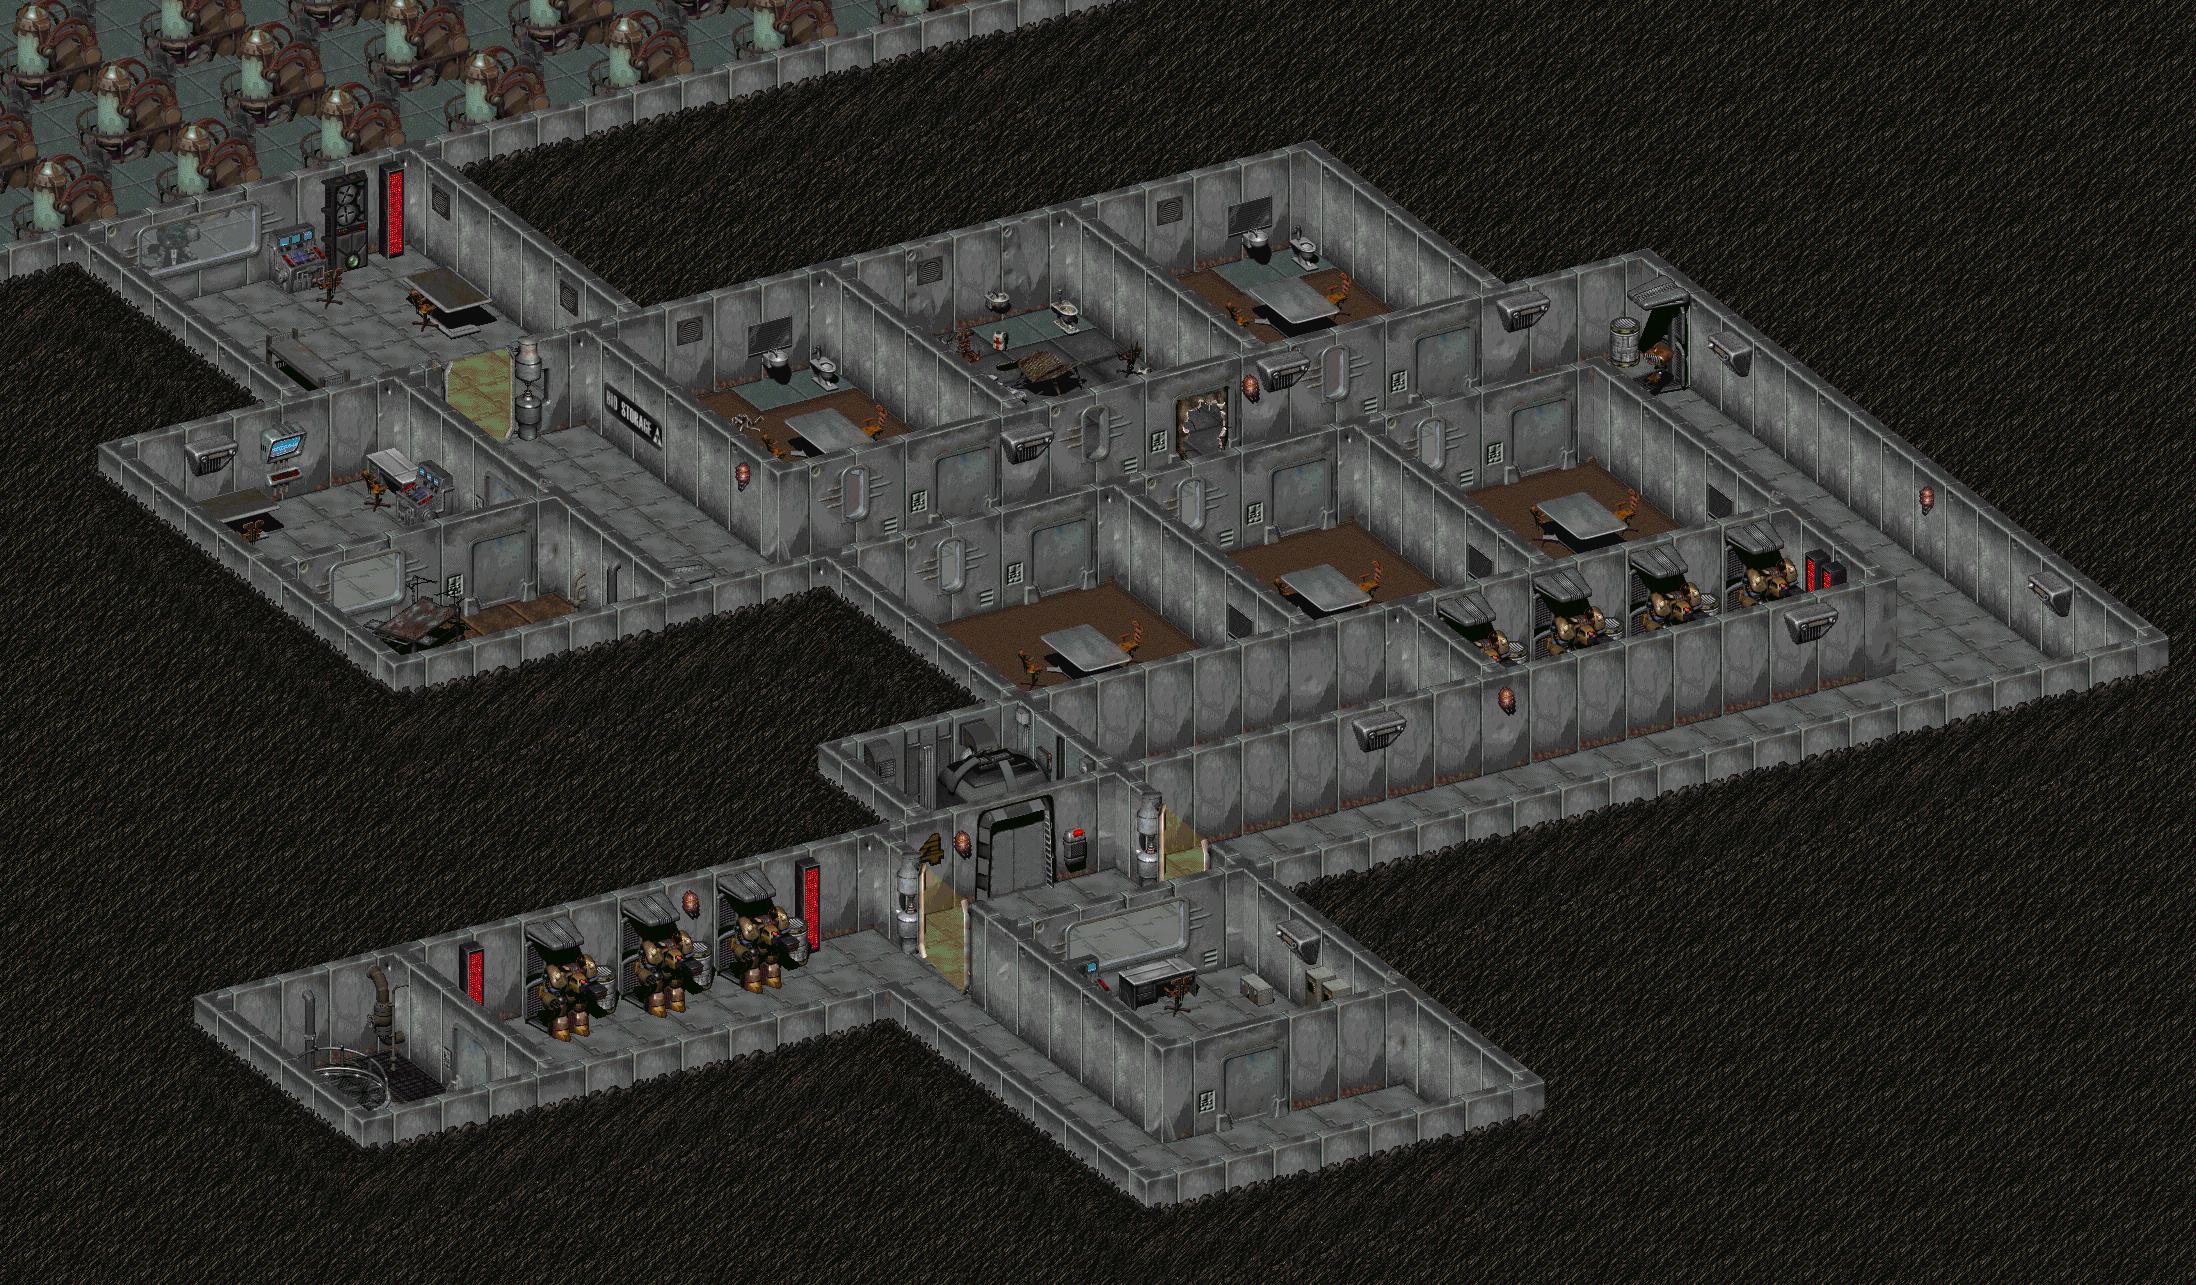 Citaten Seneca Fallout 4 : Sierra army depot the fallout wiki new vegas